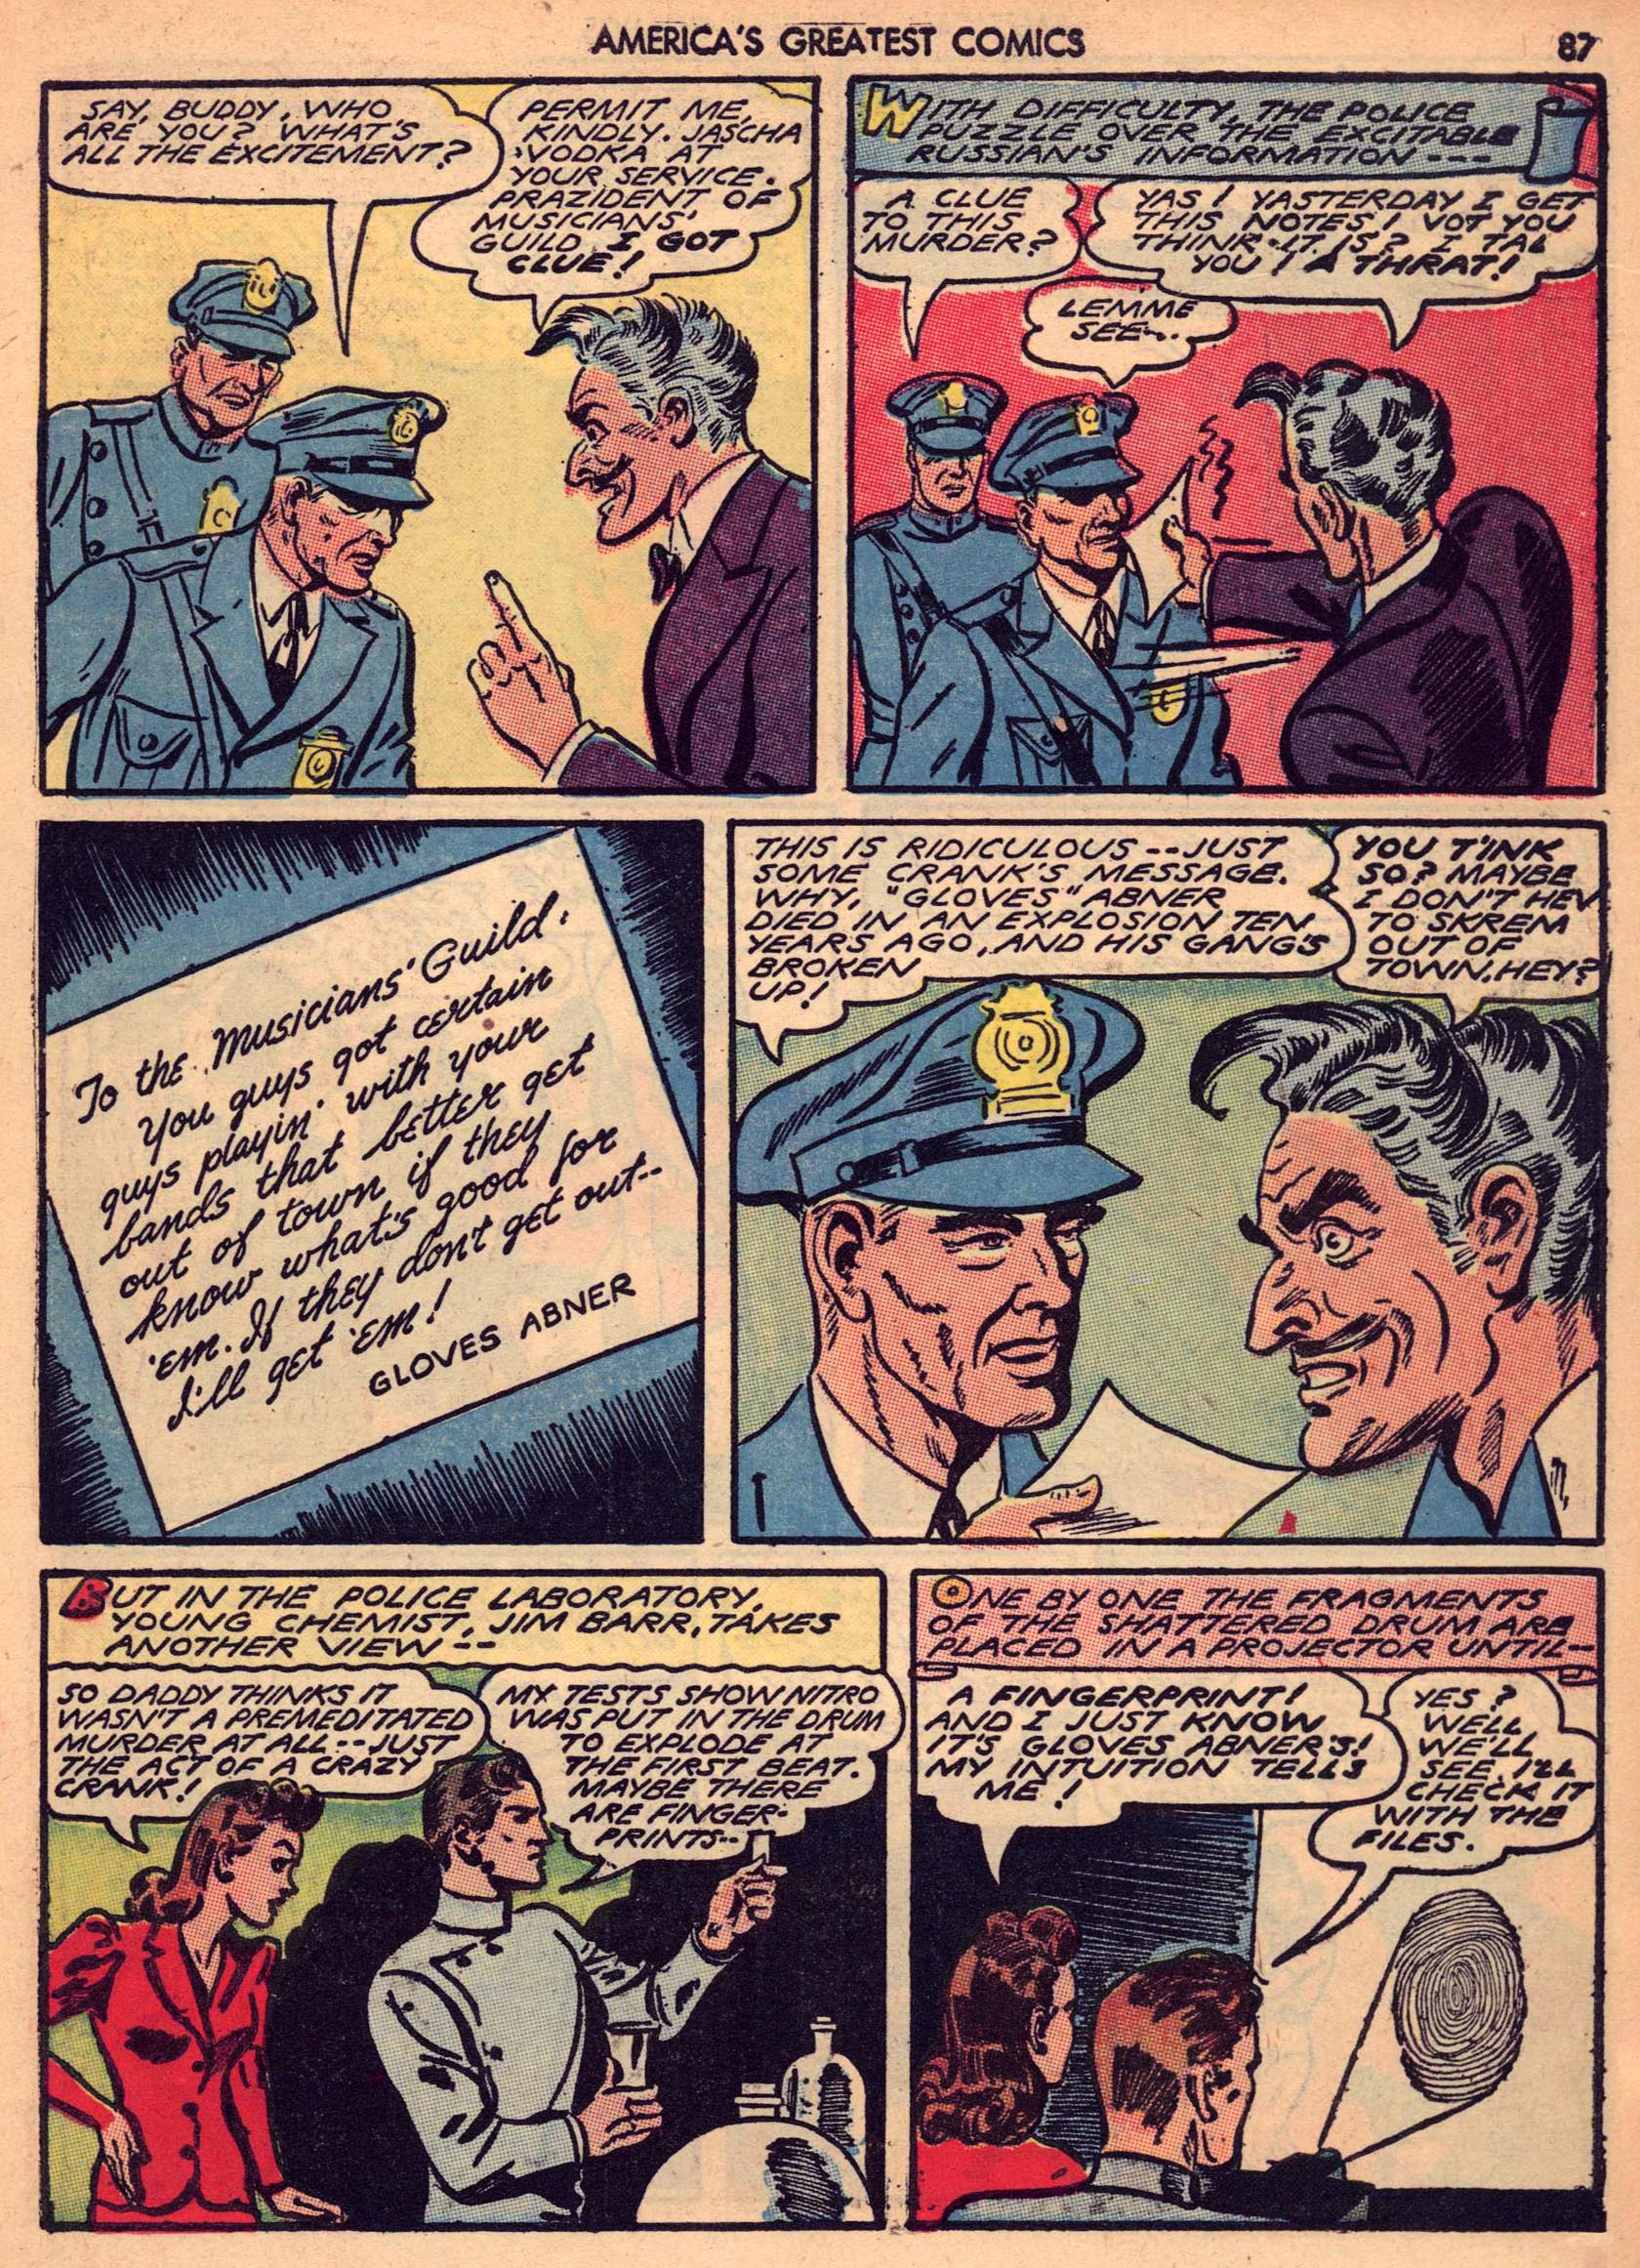 Read online America's Greatest Comics comic -  Issue #7 - 86